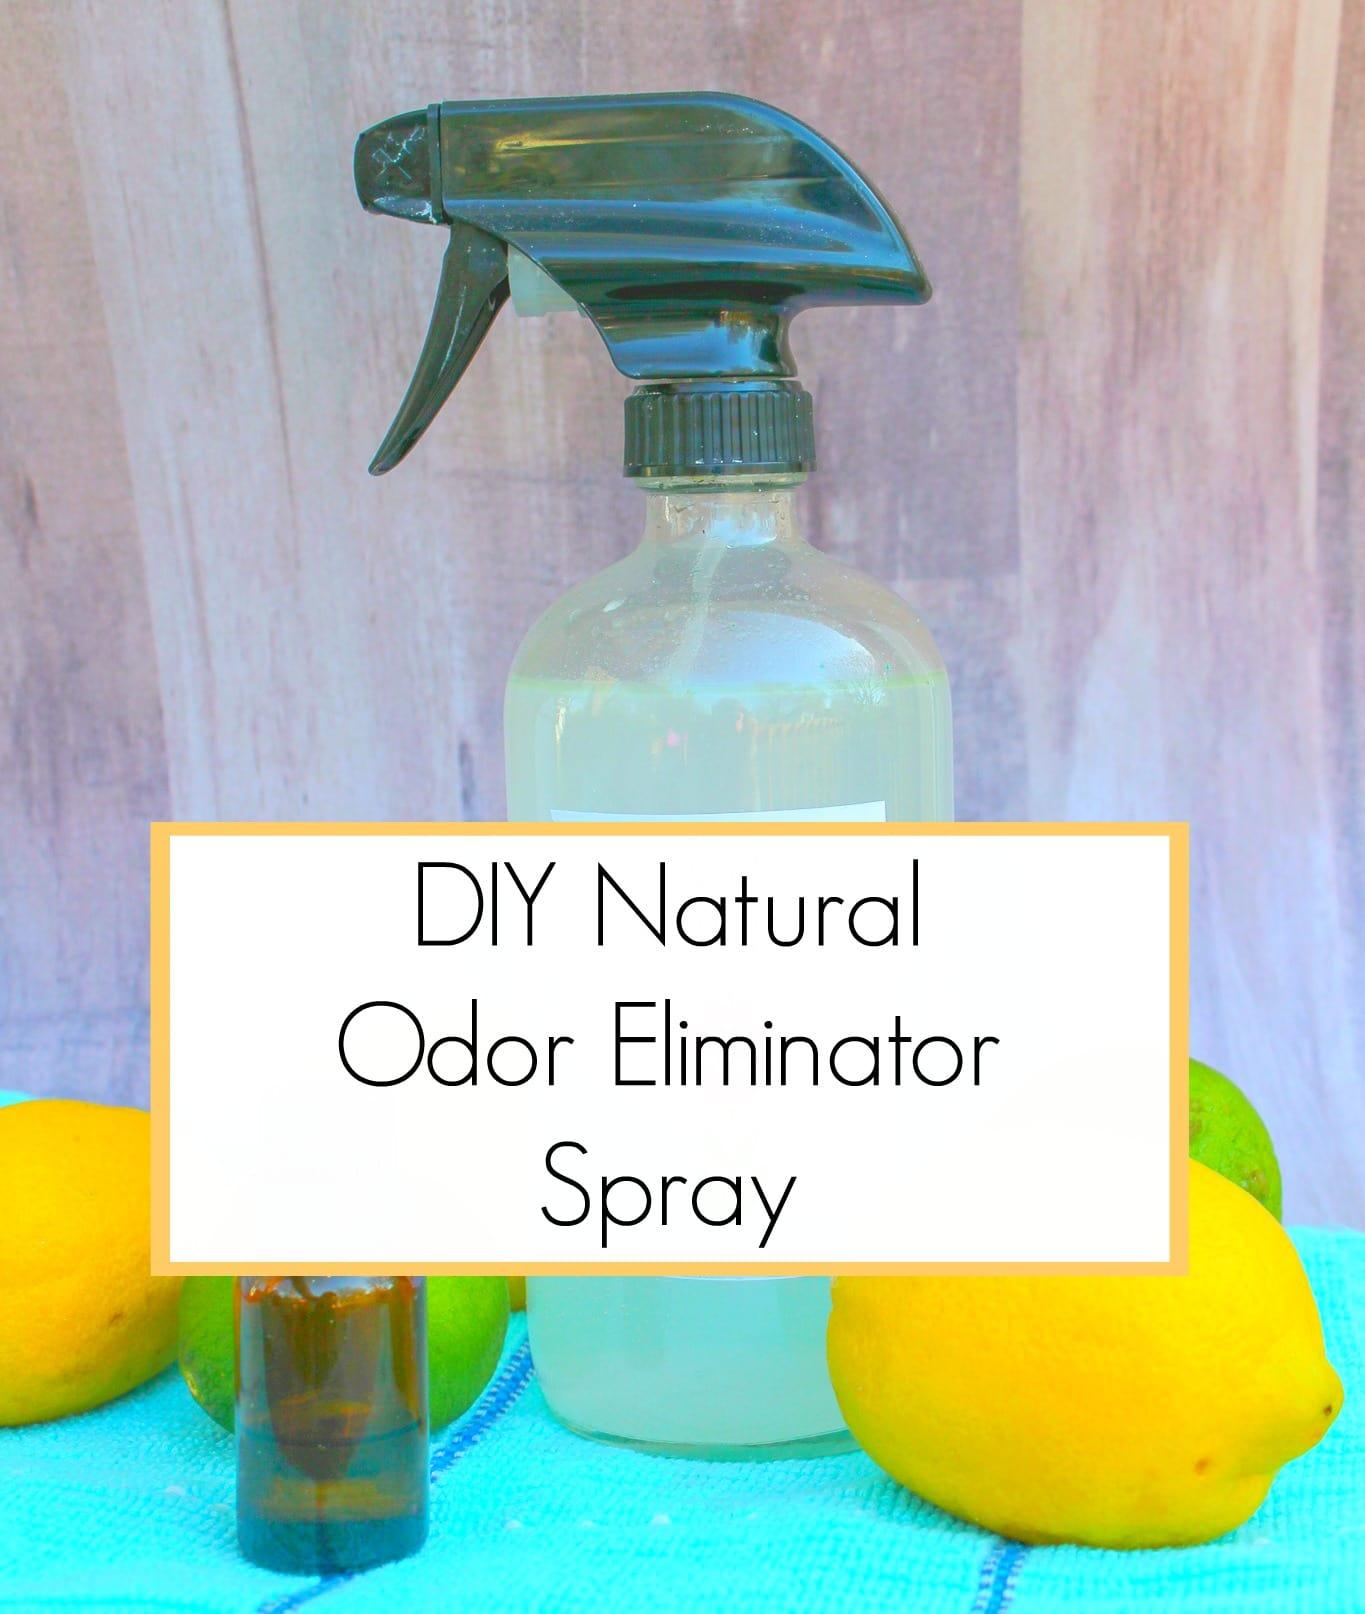 DIY Natural Odor Eliminator Spray - Get Green Be Well